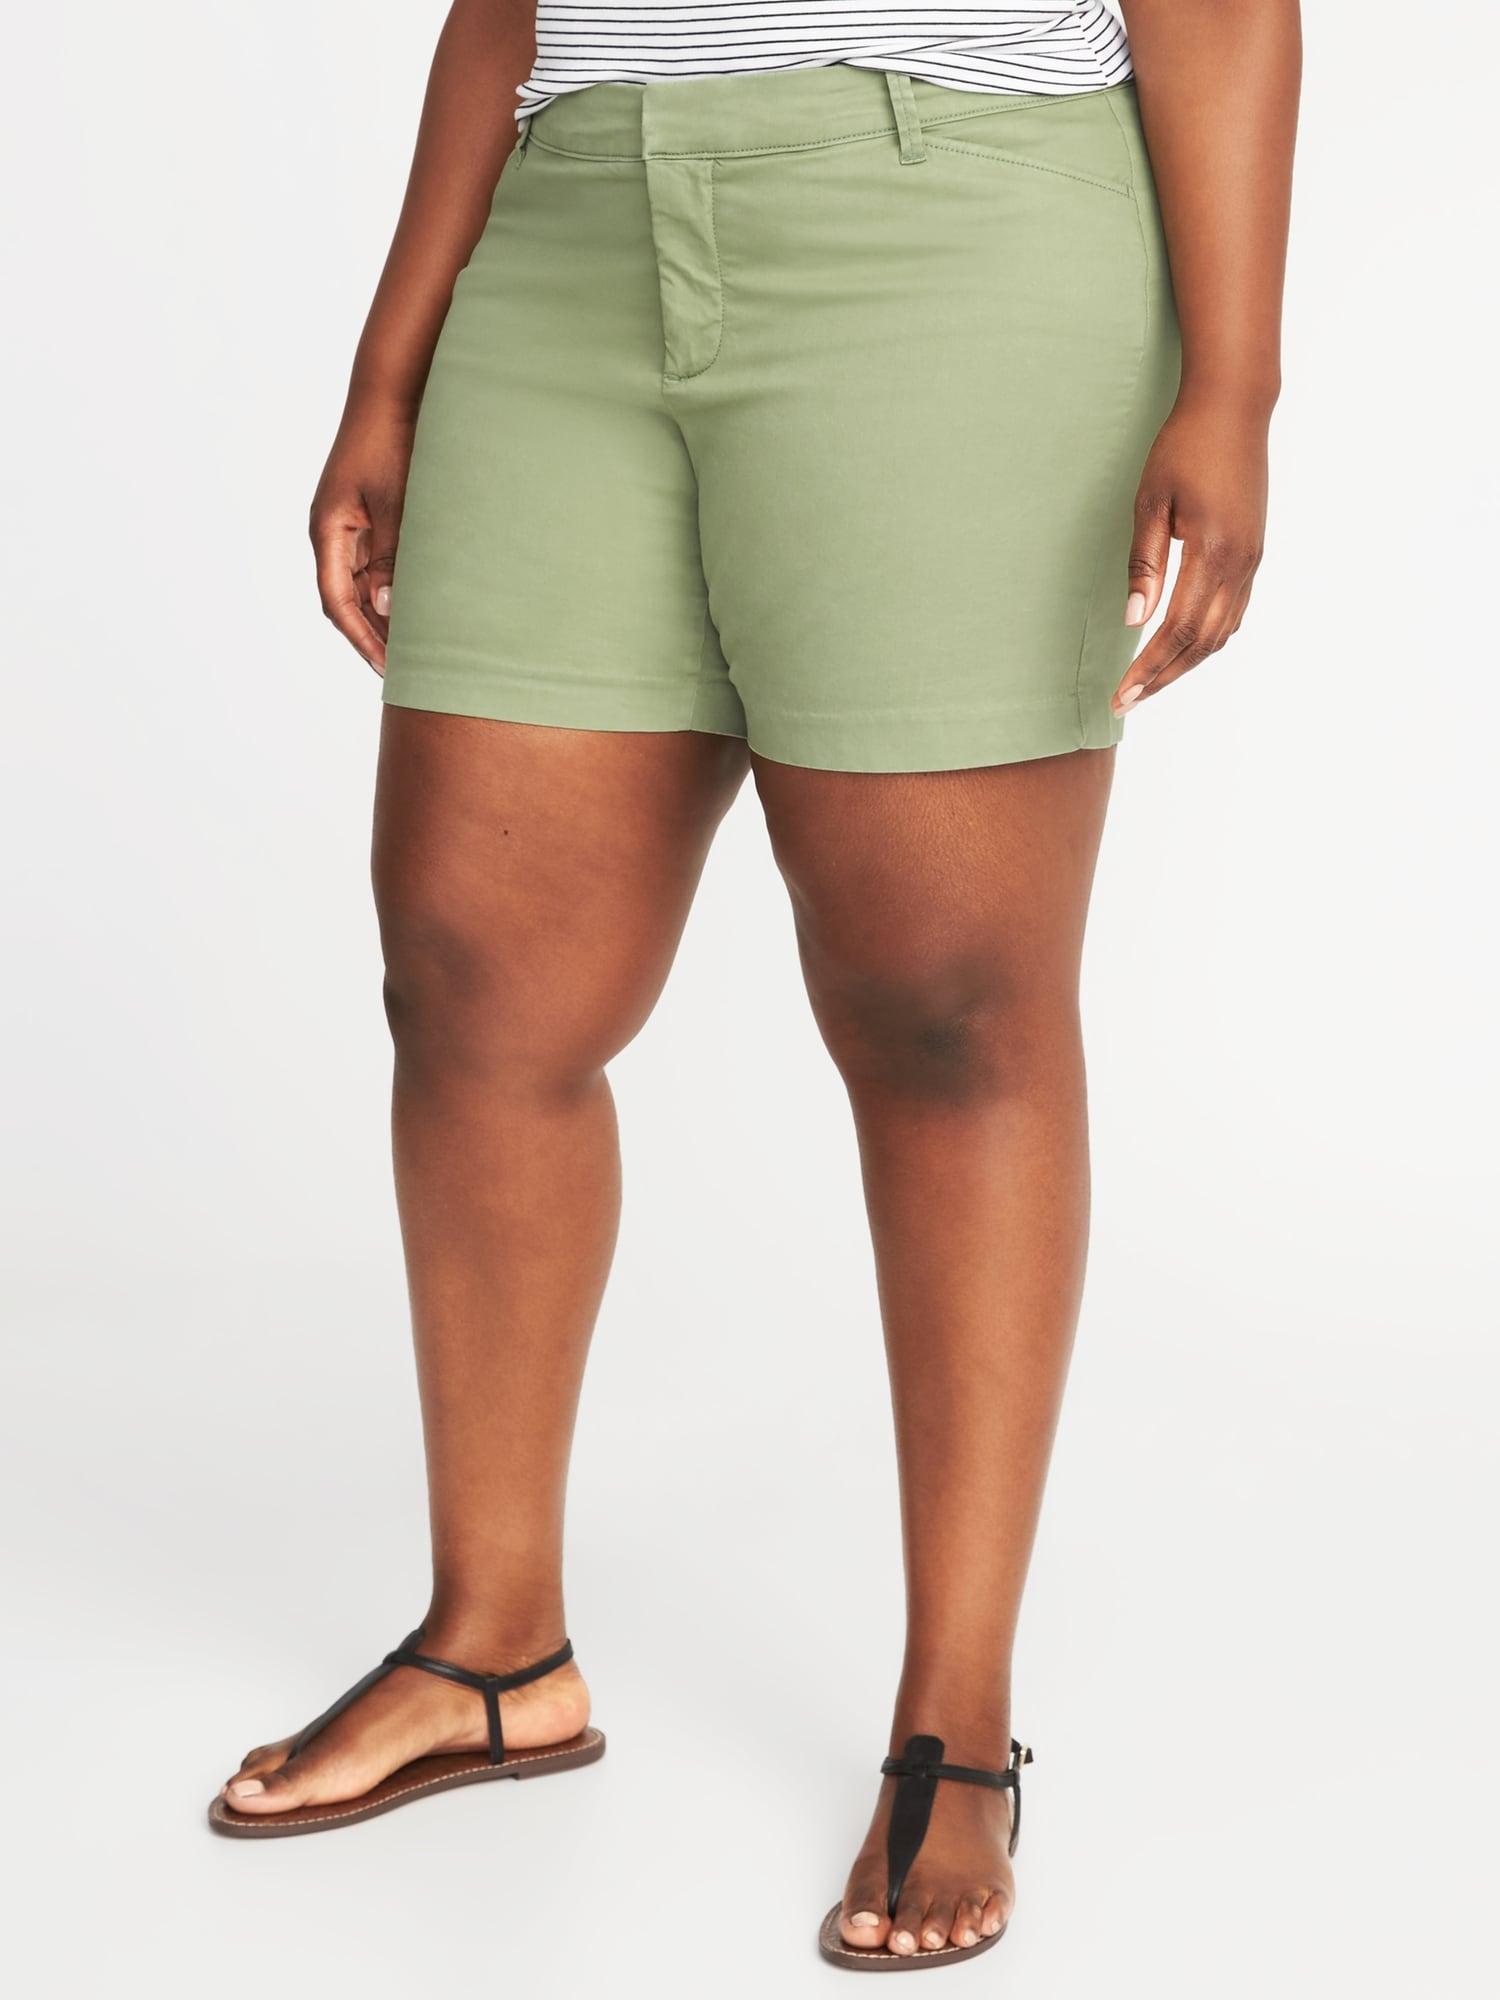 0a02c0e5205 Mid-Rise Secret-Slim Pockets Plus-Size Pixie Chino Shorts (7